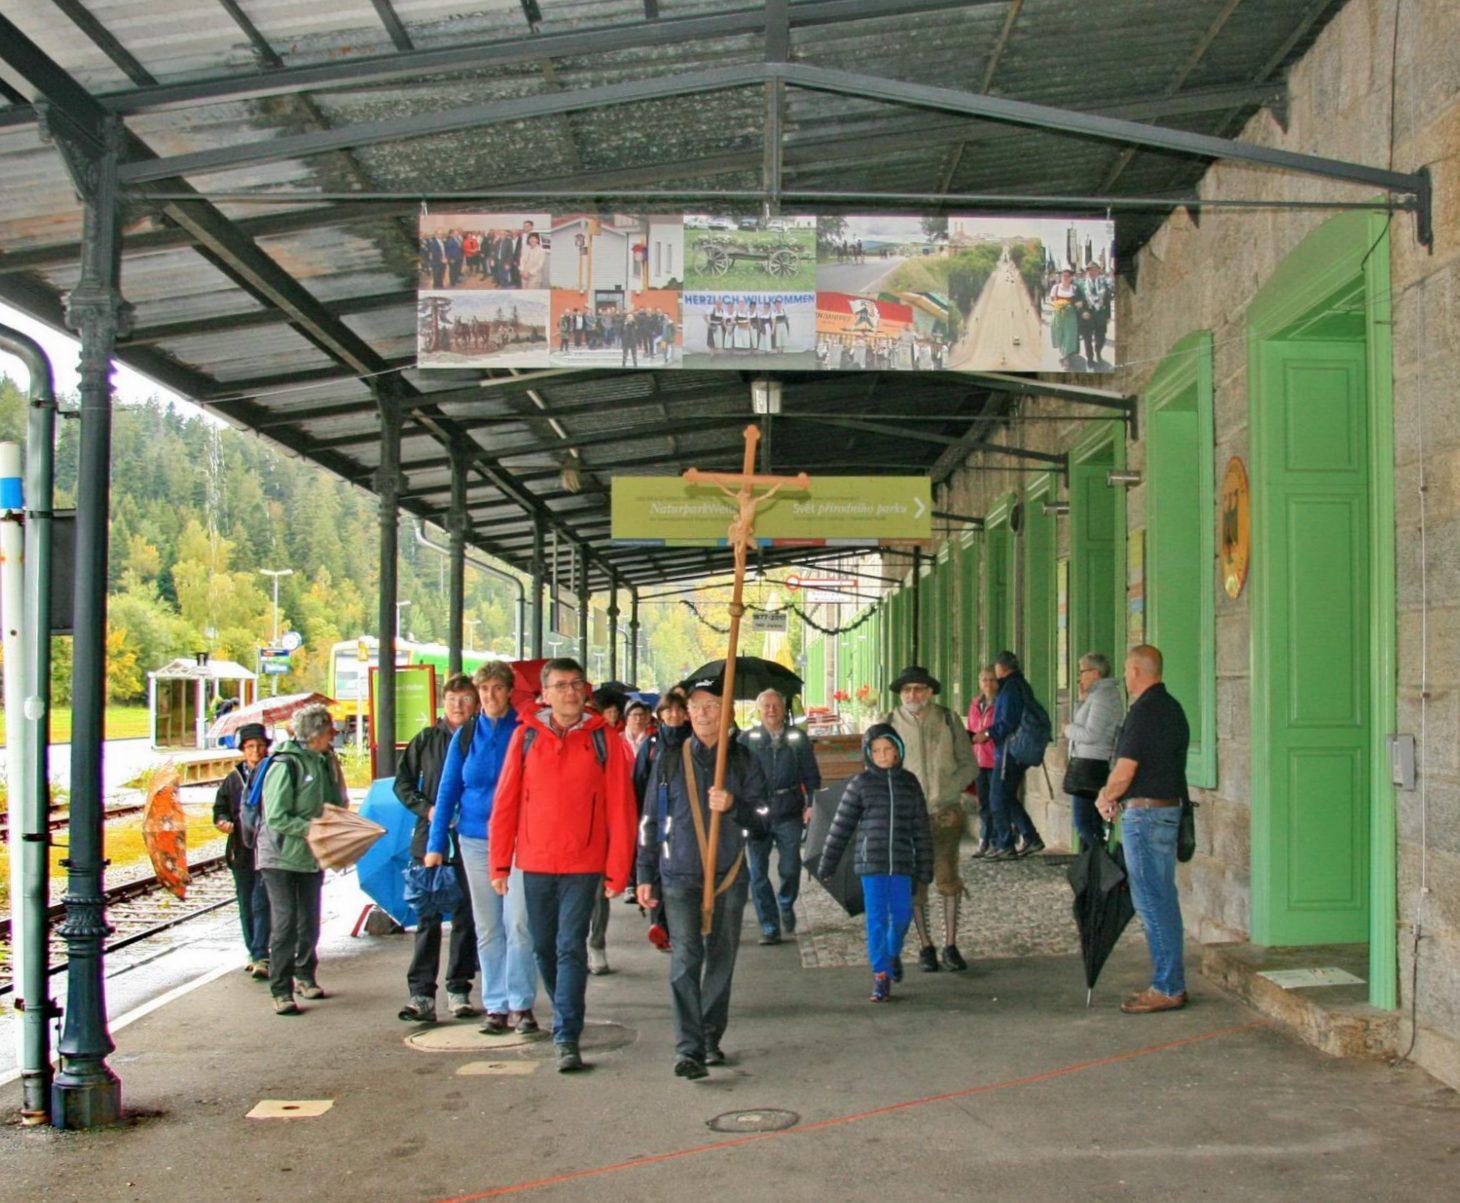 News_2019_Annawallfahrt-2019-Grenzbahnhof-GHaller-r